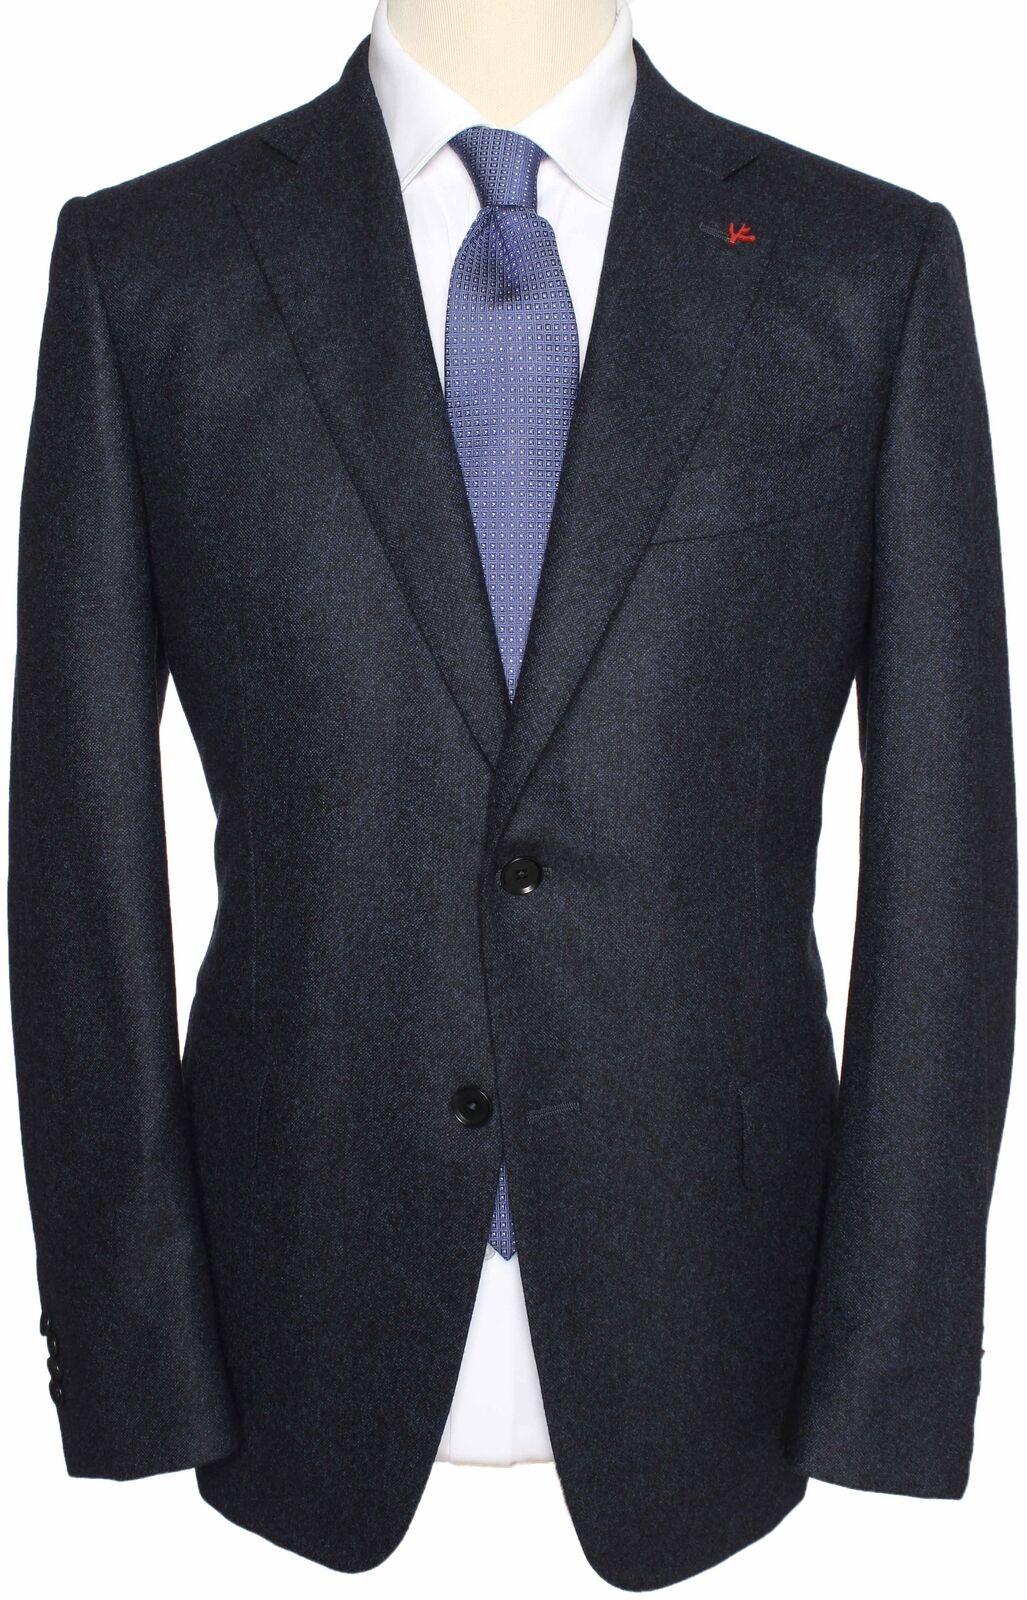 NWT ISAIA BLAZER jacket Gregory Blau wool pinpoint handmade  52 us 42